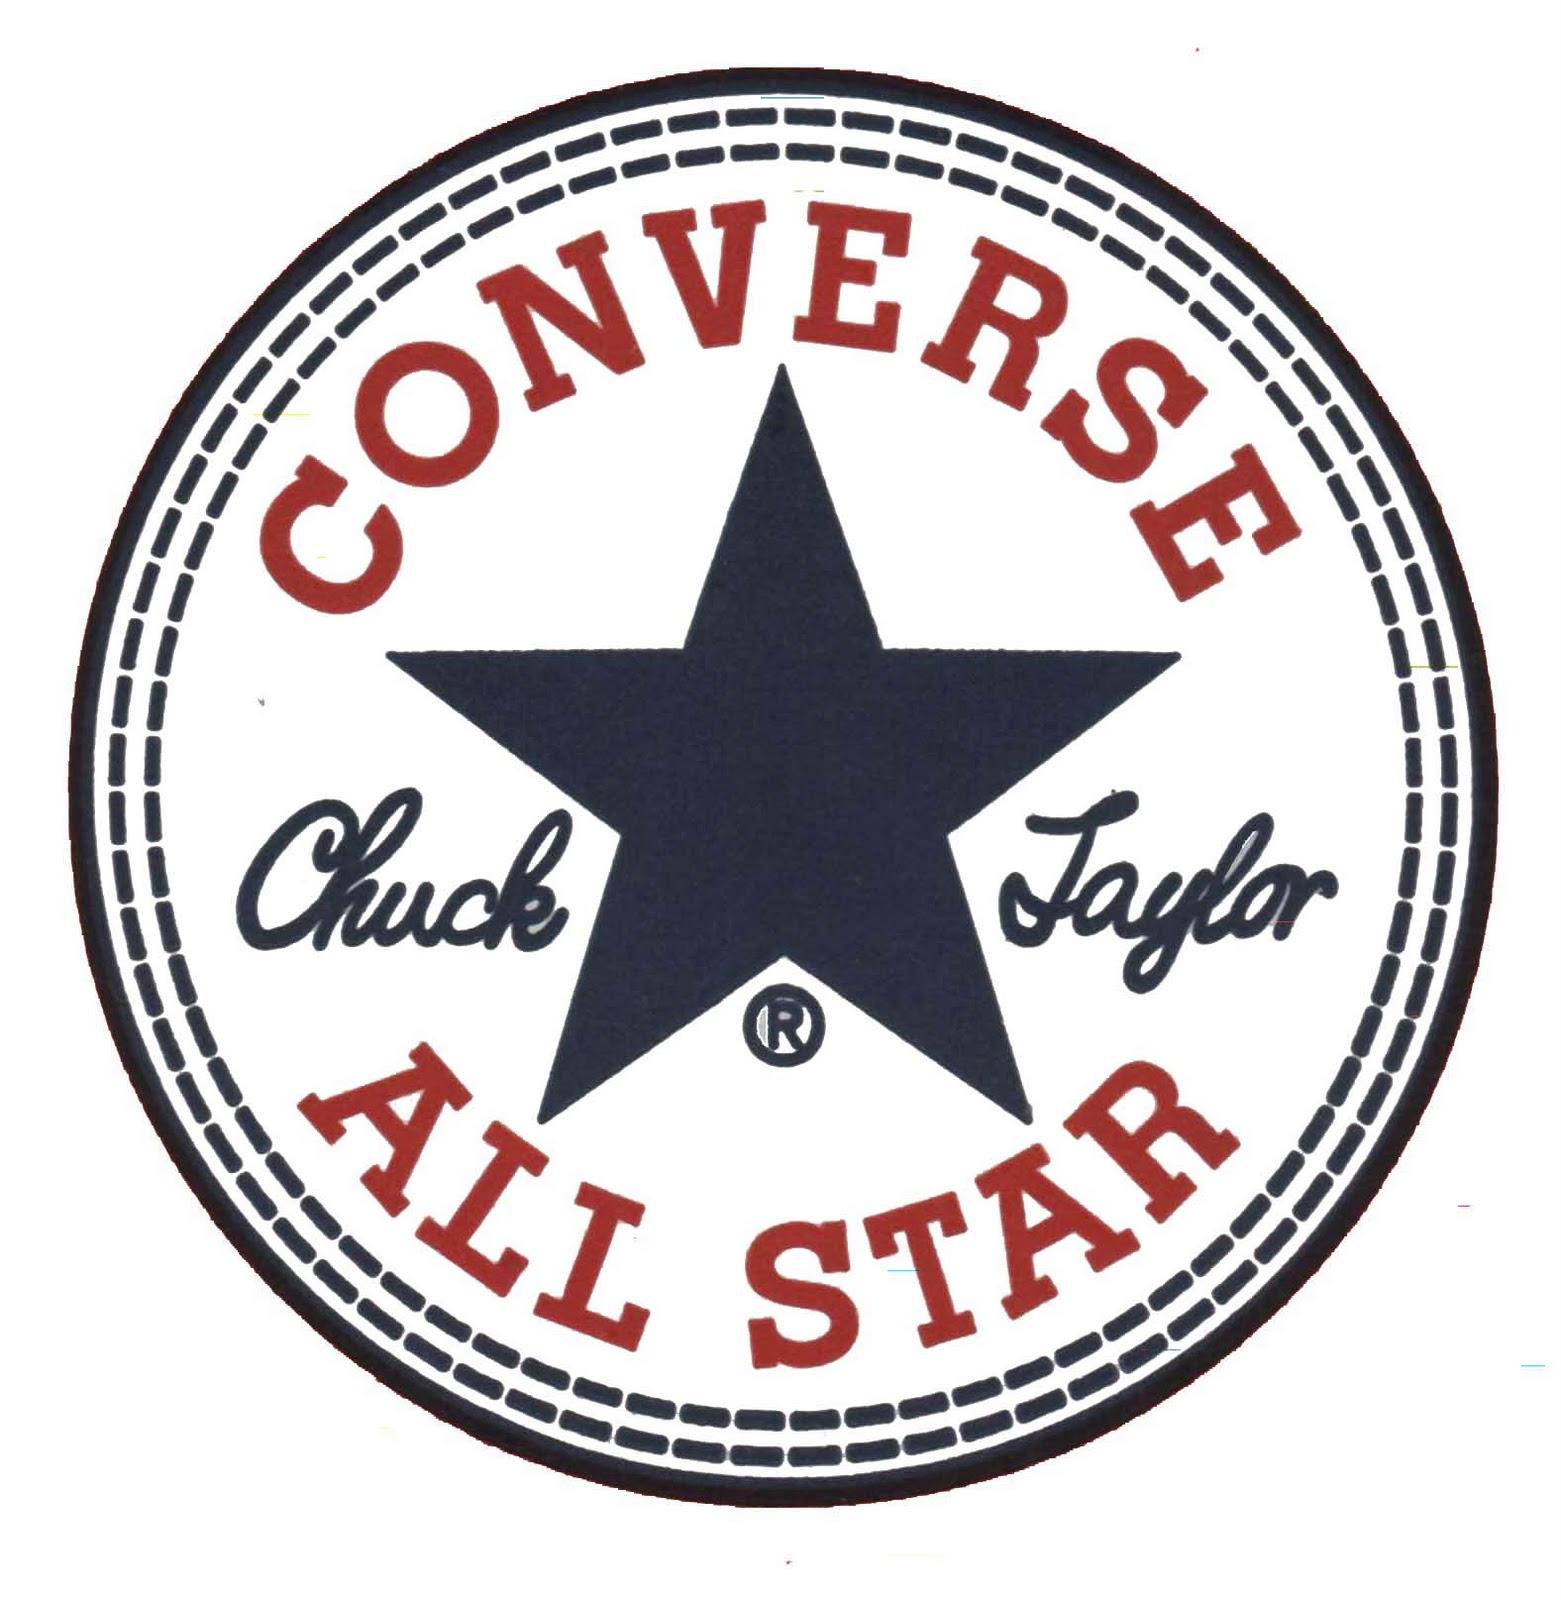 All_star_converse_logo